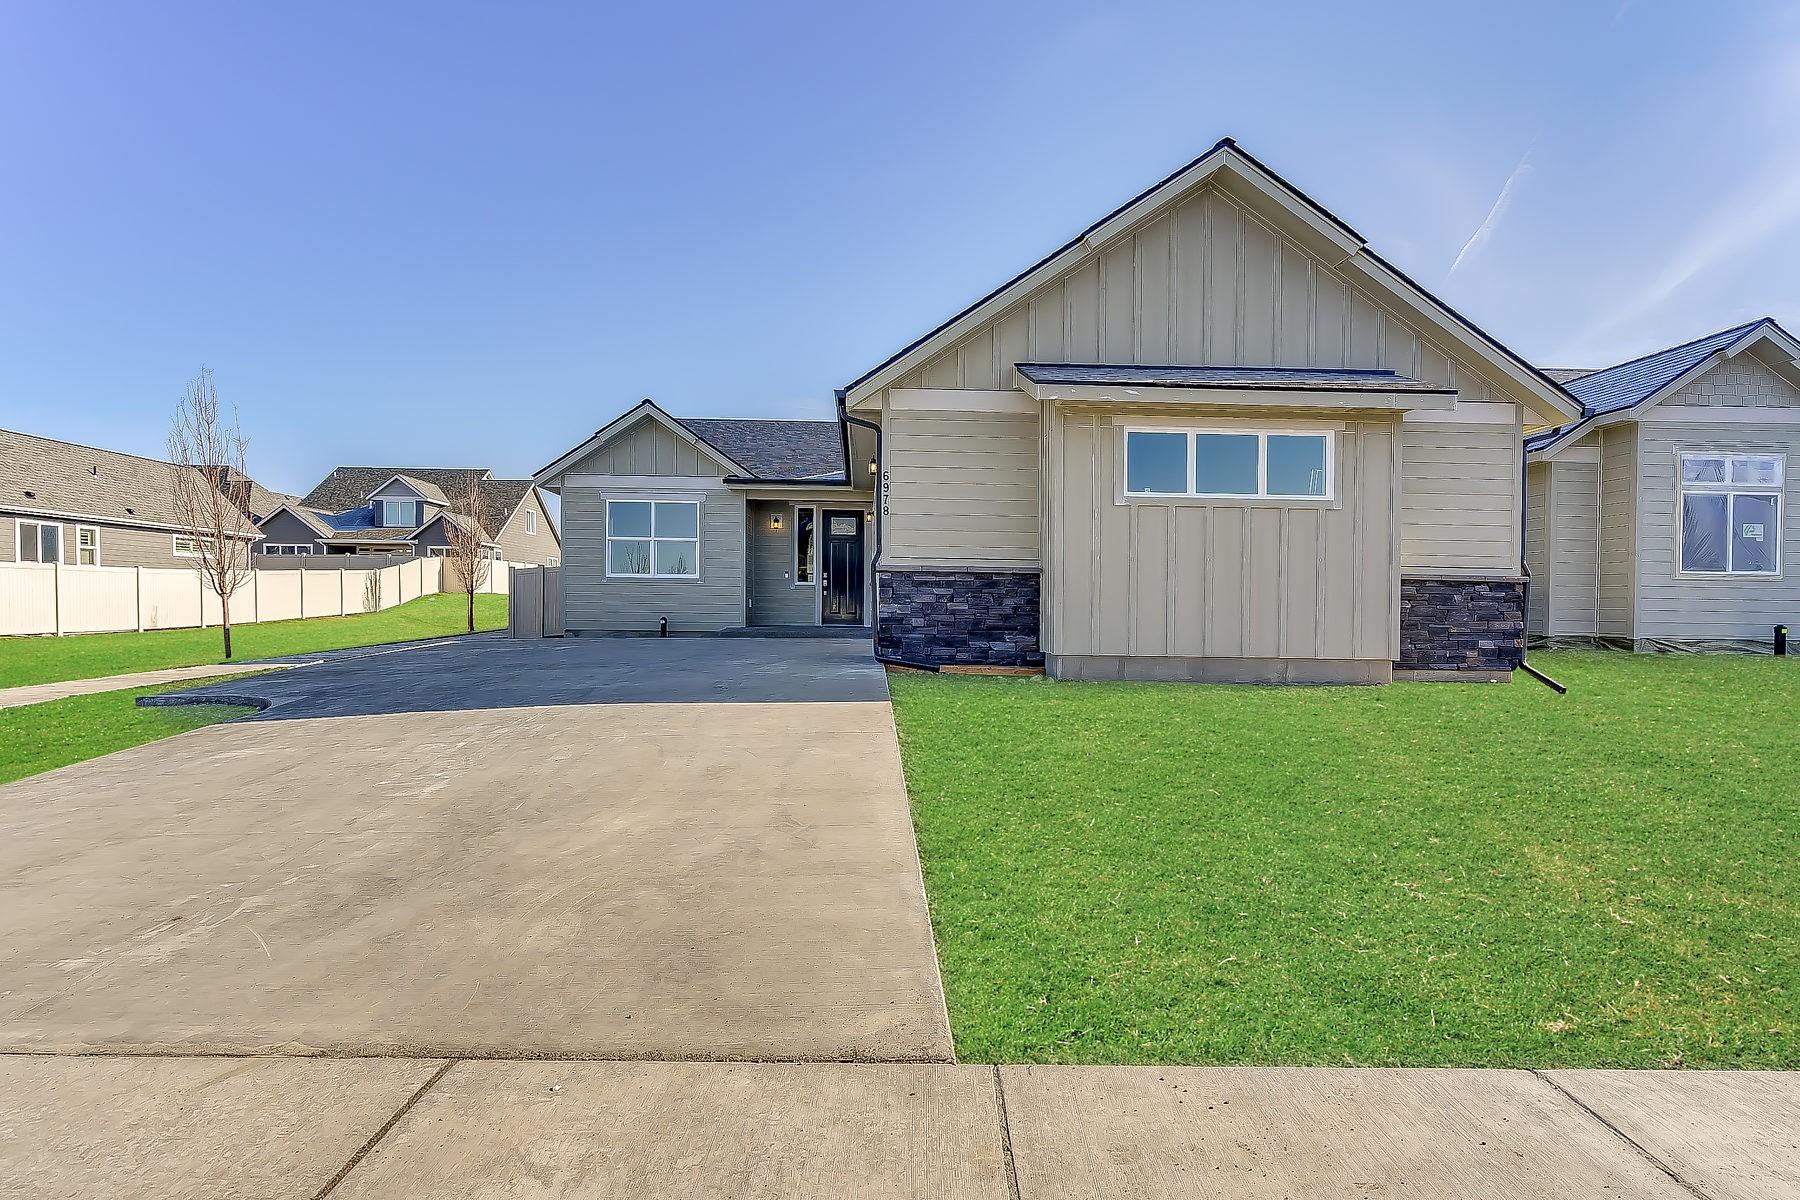 Single Family Homes für Verkauf beim 3664 N Cyprus Fox Lp 3670 N Cyprus Fox Loop, Post Falls, Idaho 83854 Vereinigte Staaten